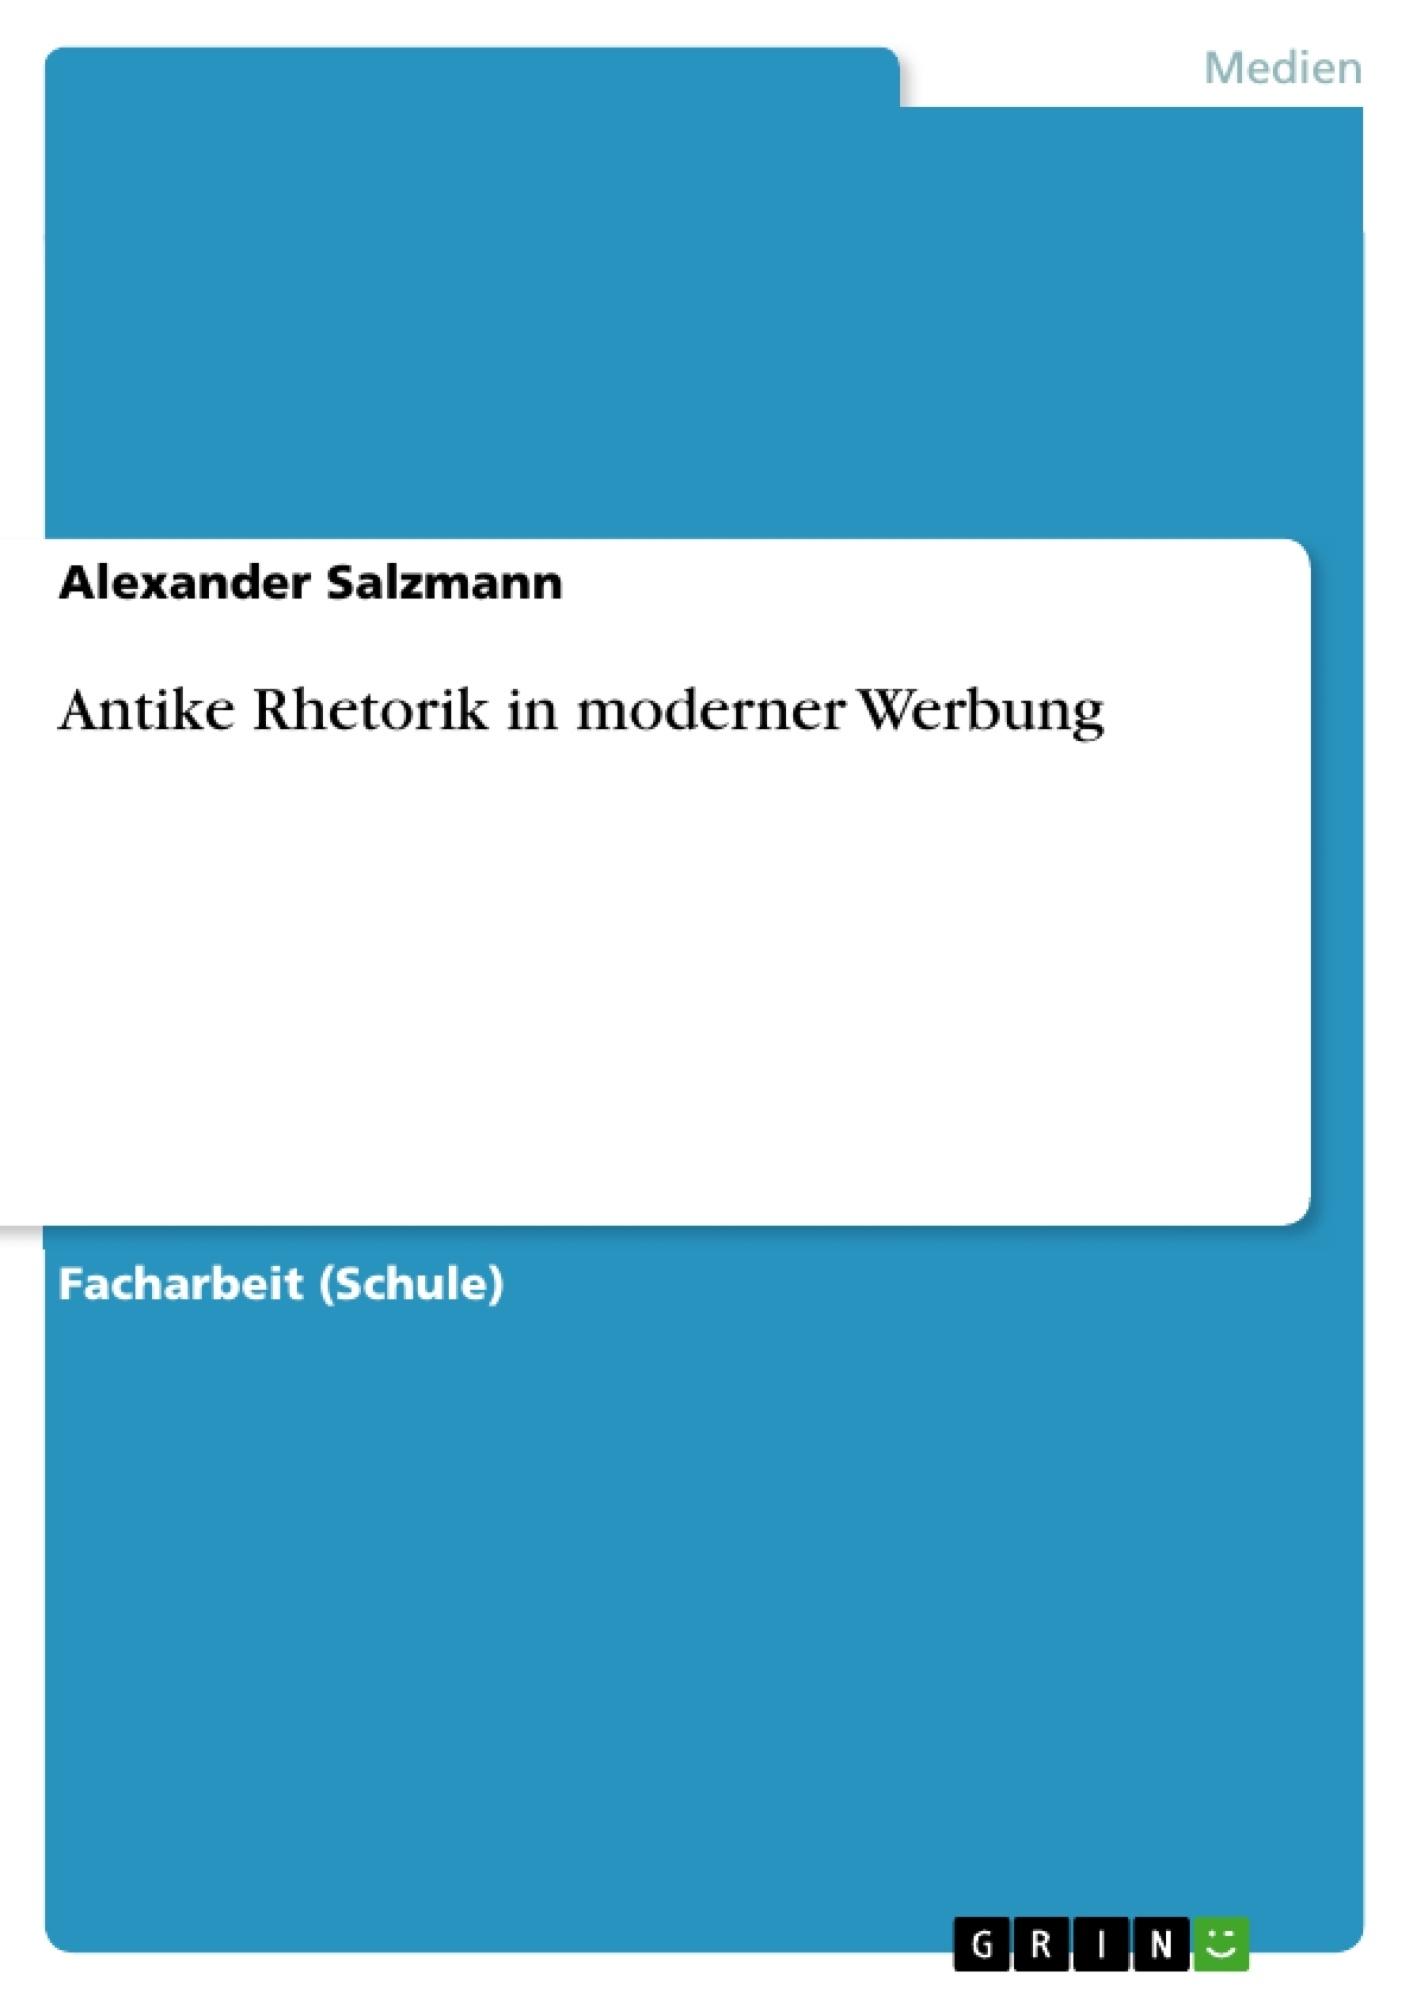 Titel: Antike Rhetorik in moderner Werbung